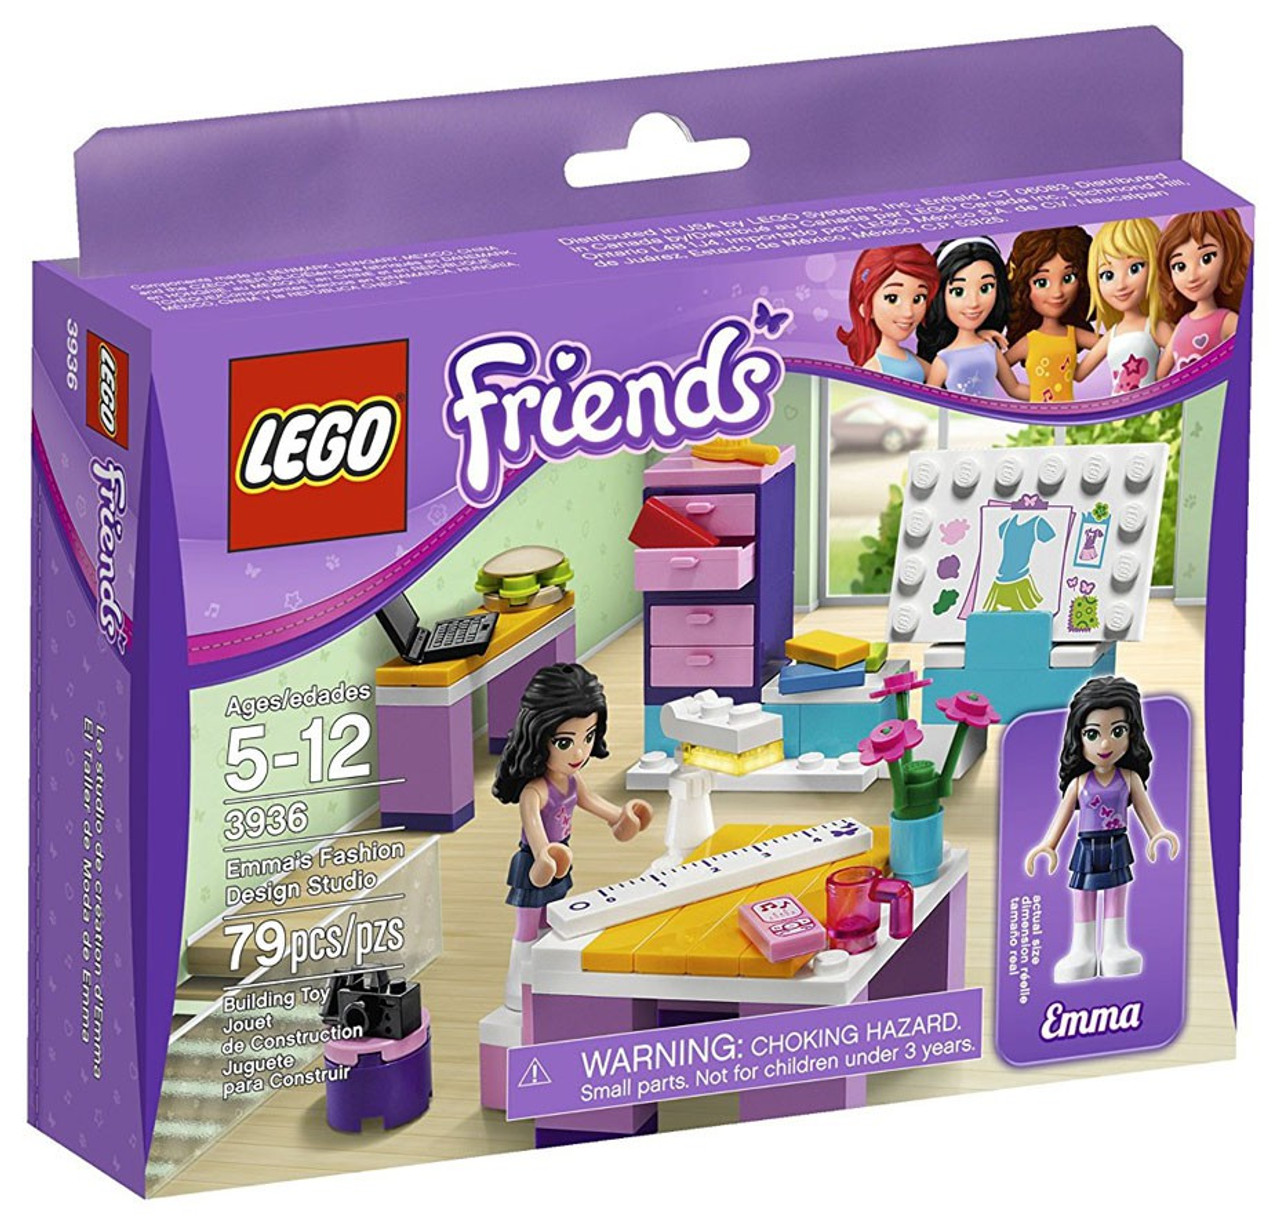 LEGO Friends Emmas Fashion Design Studio Set 3936 - ToyWiz